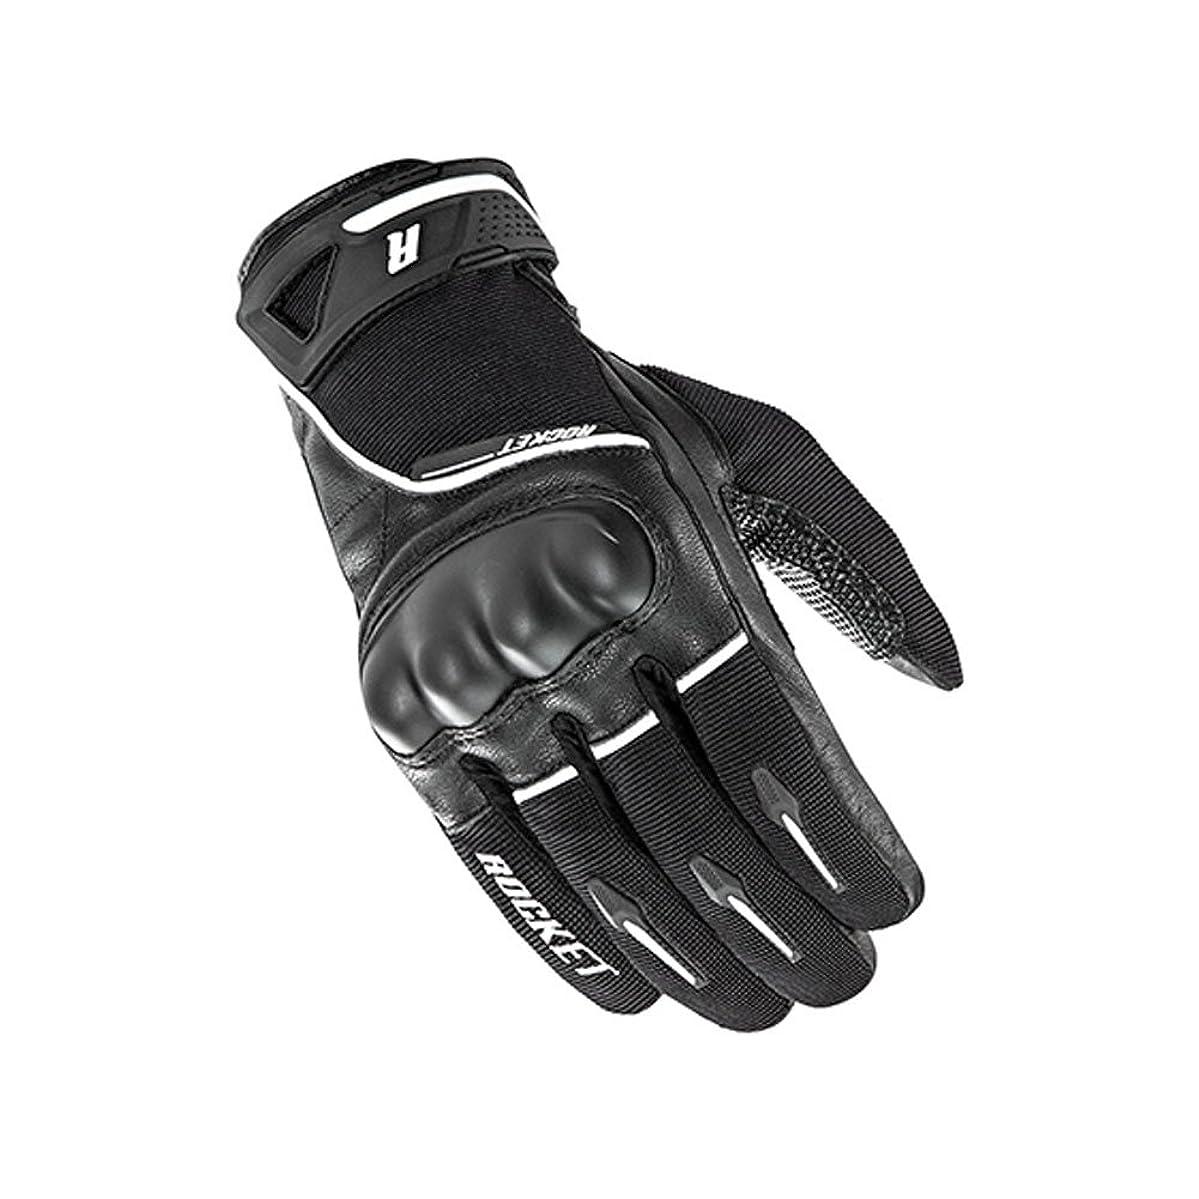 Joe Rocket Supermoto Mens On-Road Motorcycle Leather Gloves - Black/White/Large